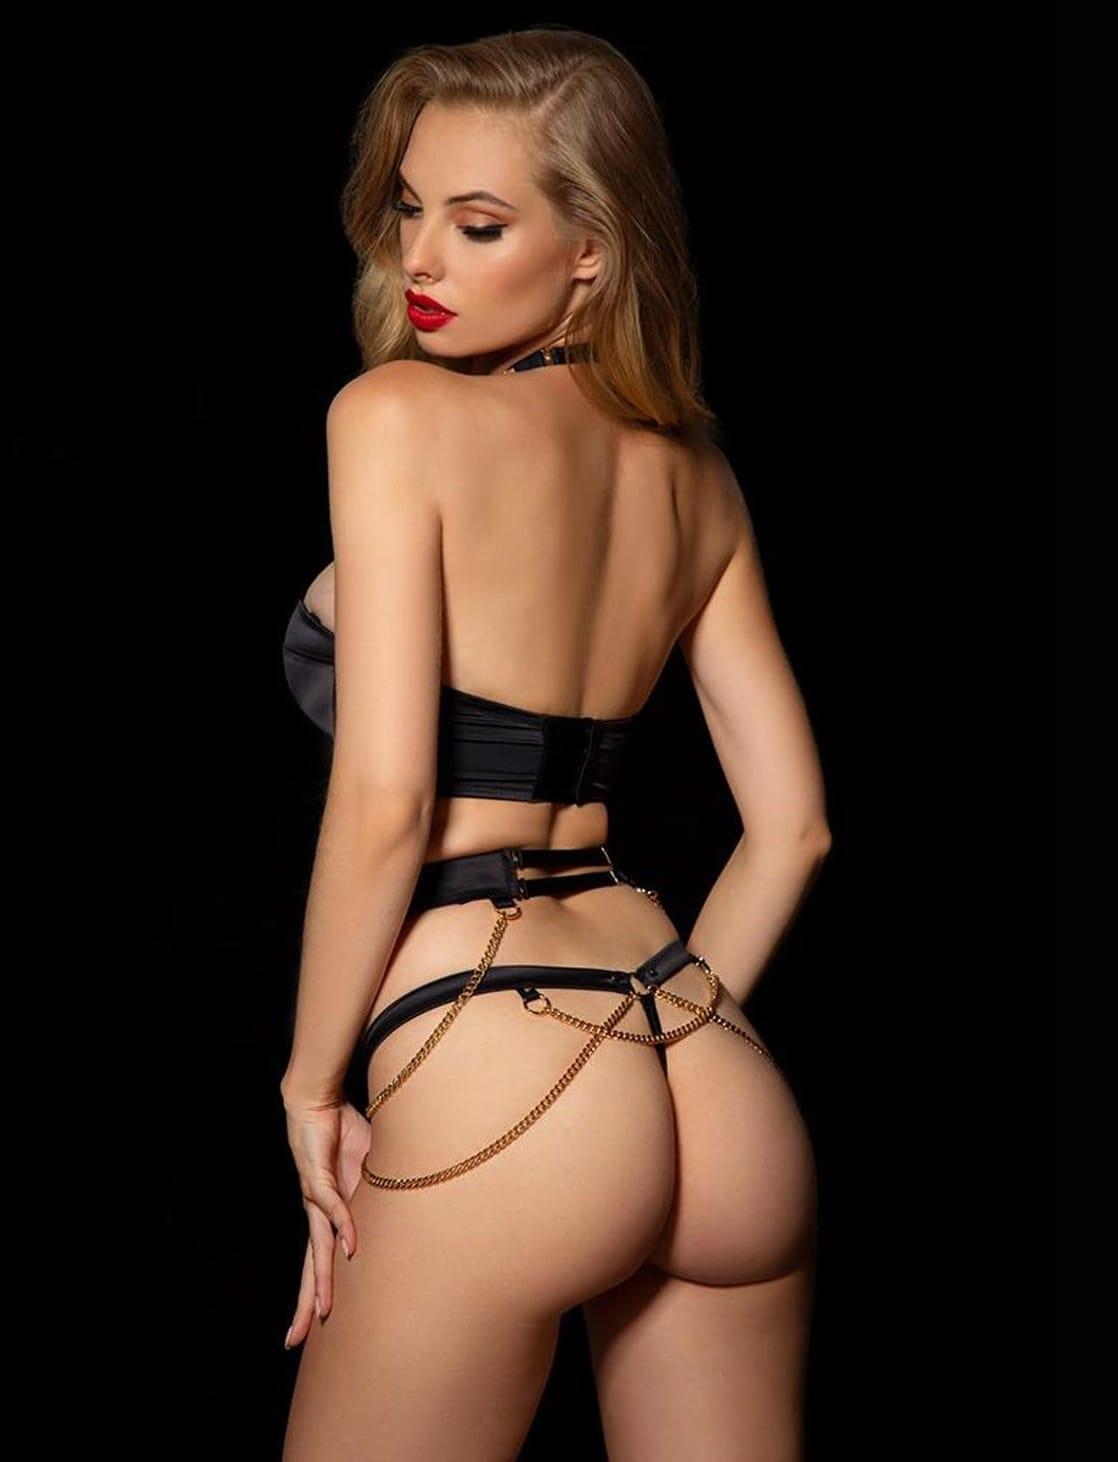 Erotica Dioni Tabbers nude photos 2019